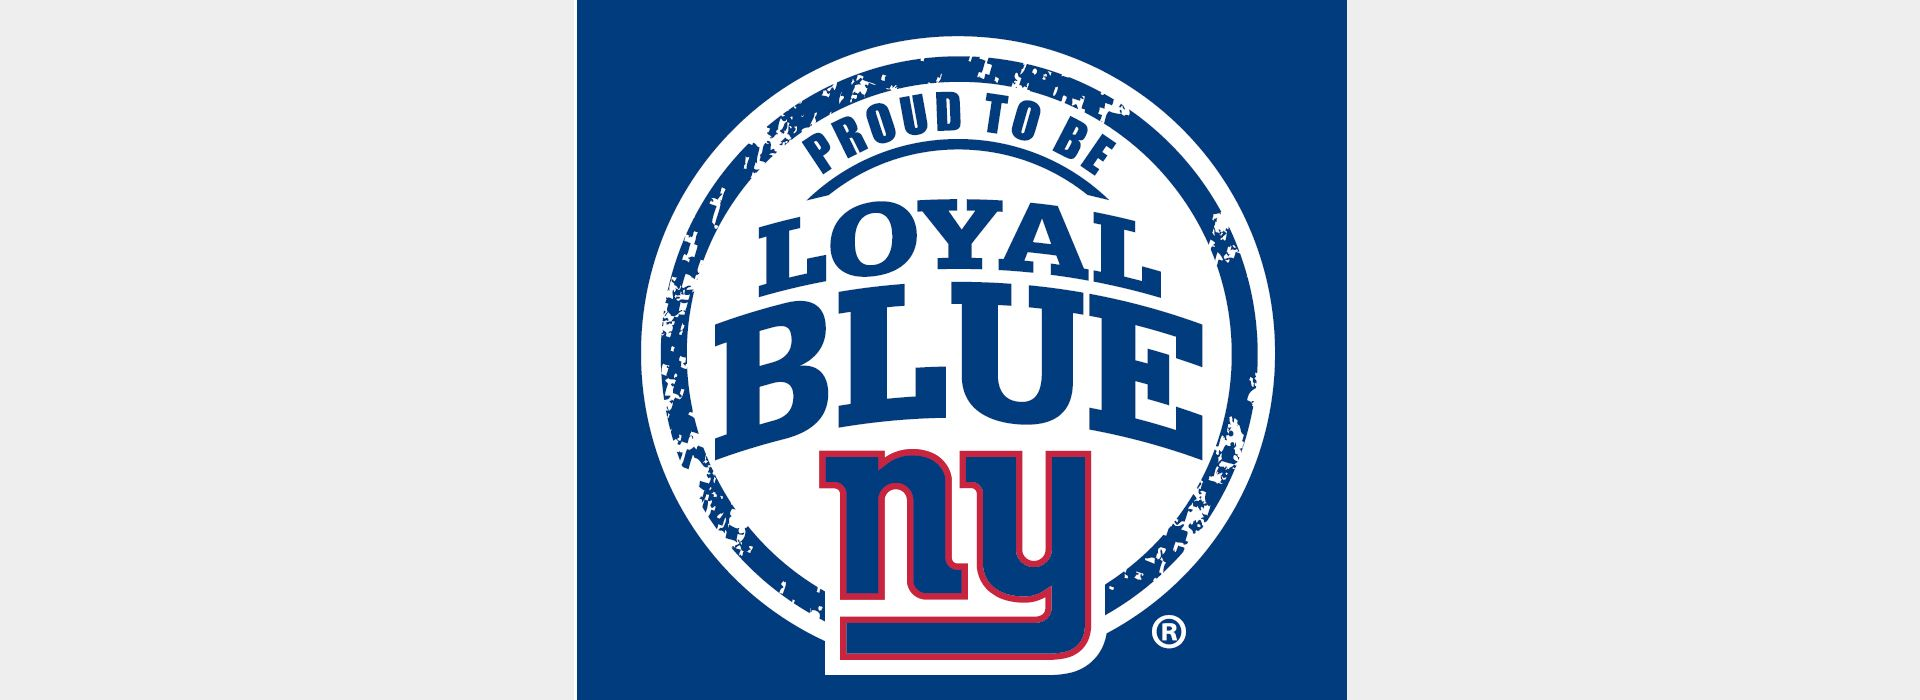 loyal-blue